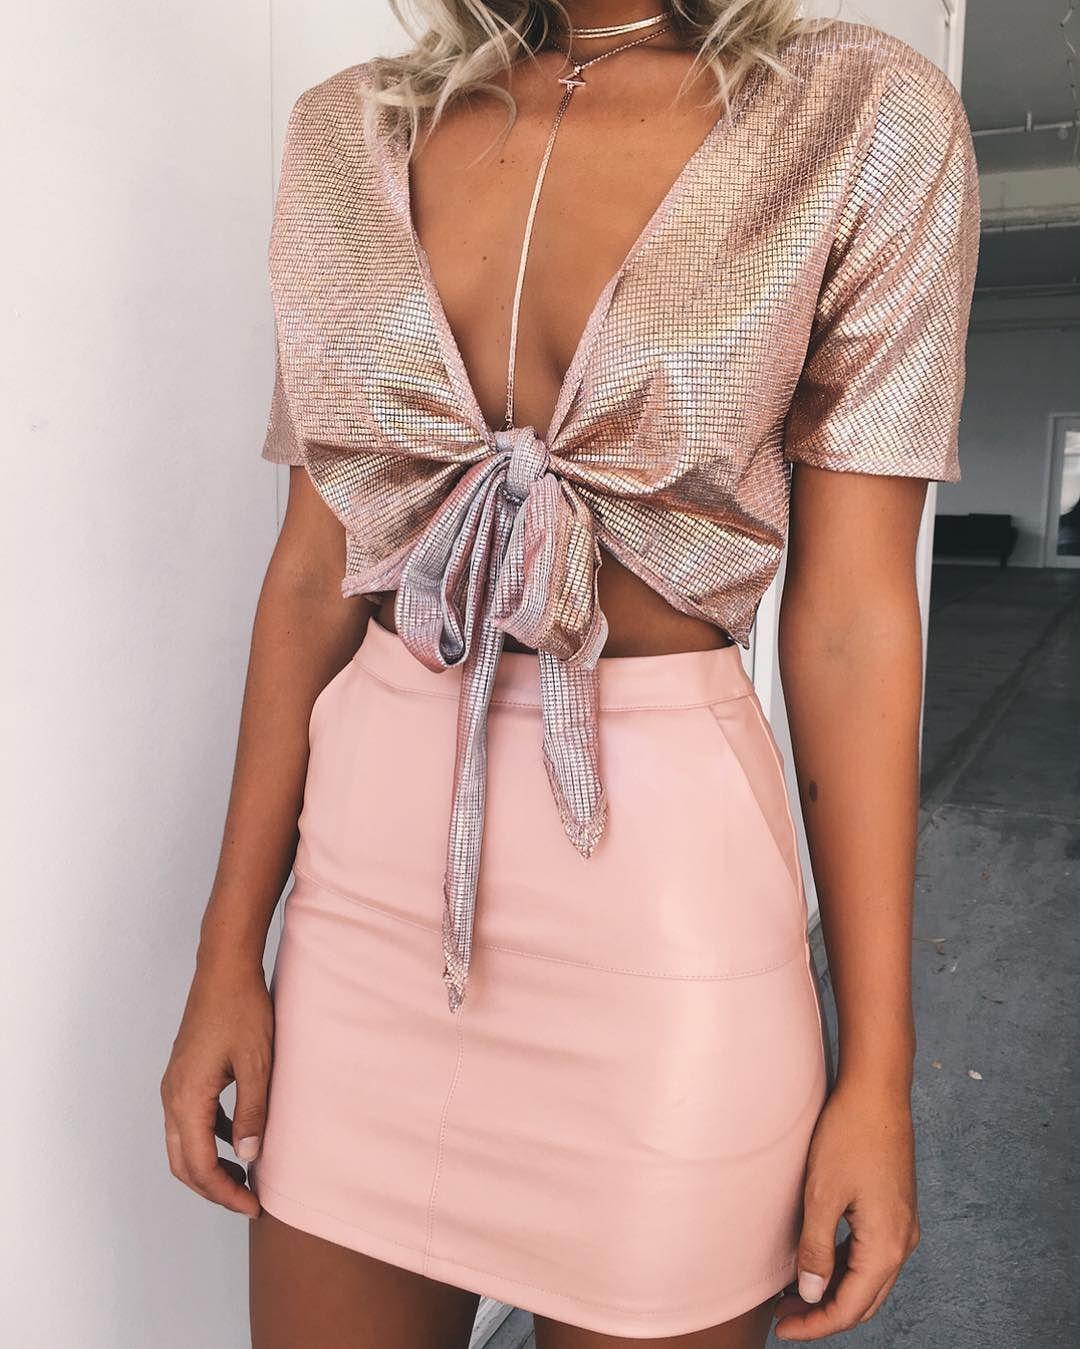 Pin de Bethany Lewenczuk en fashion!!   Pinterest   Ropa, Blusas y Noche